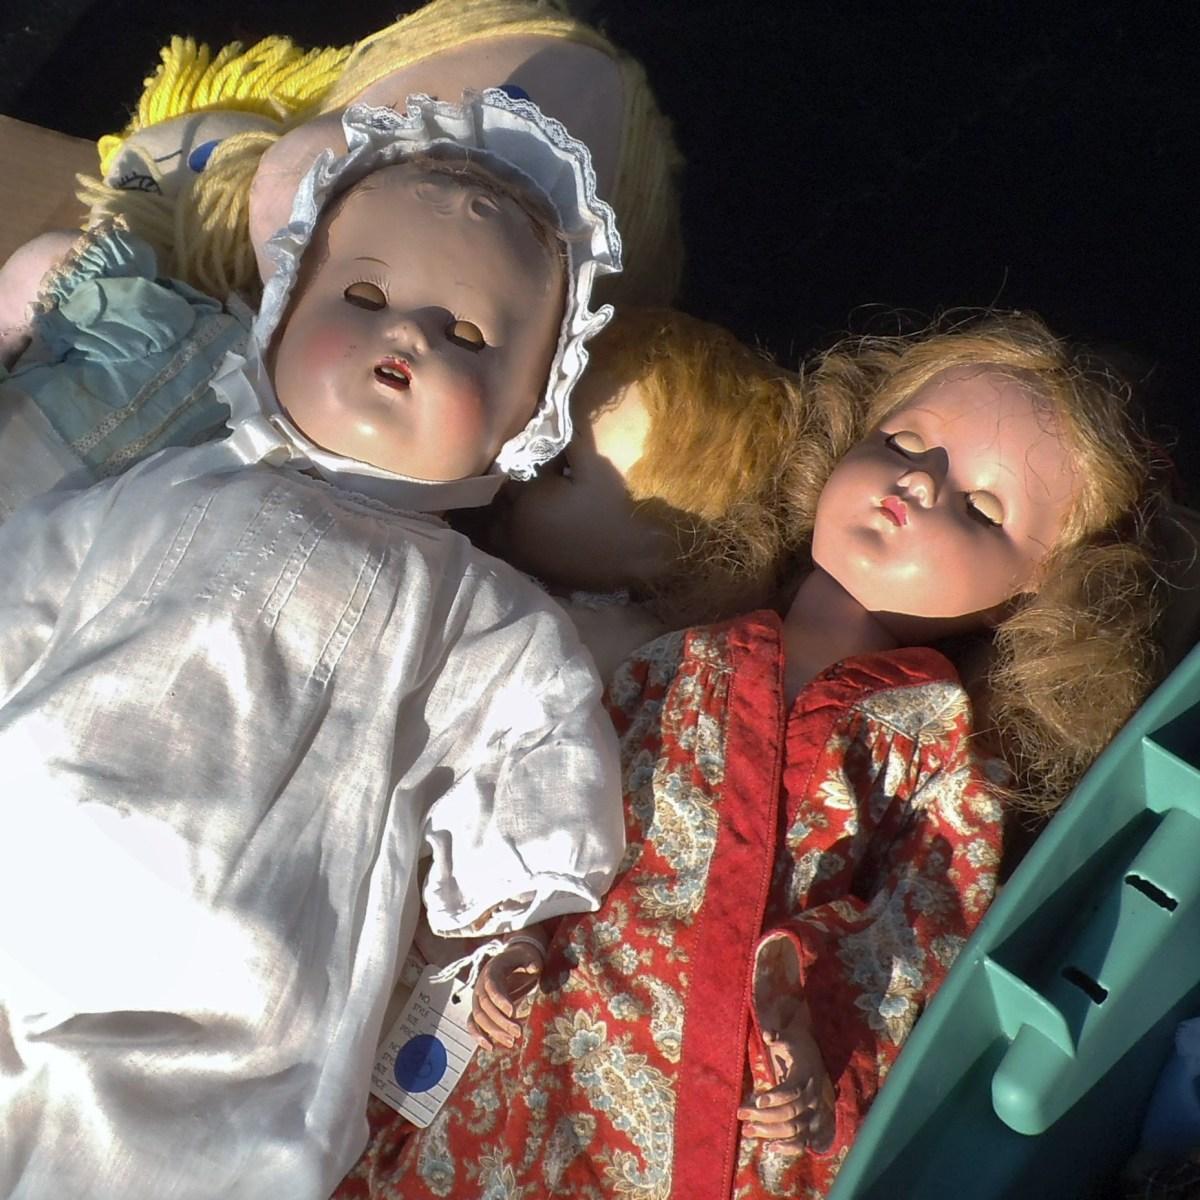 Vintage dolls.